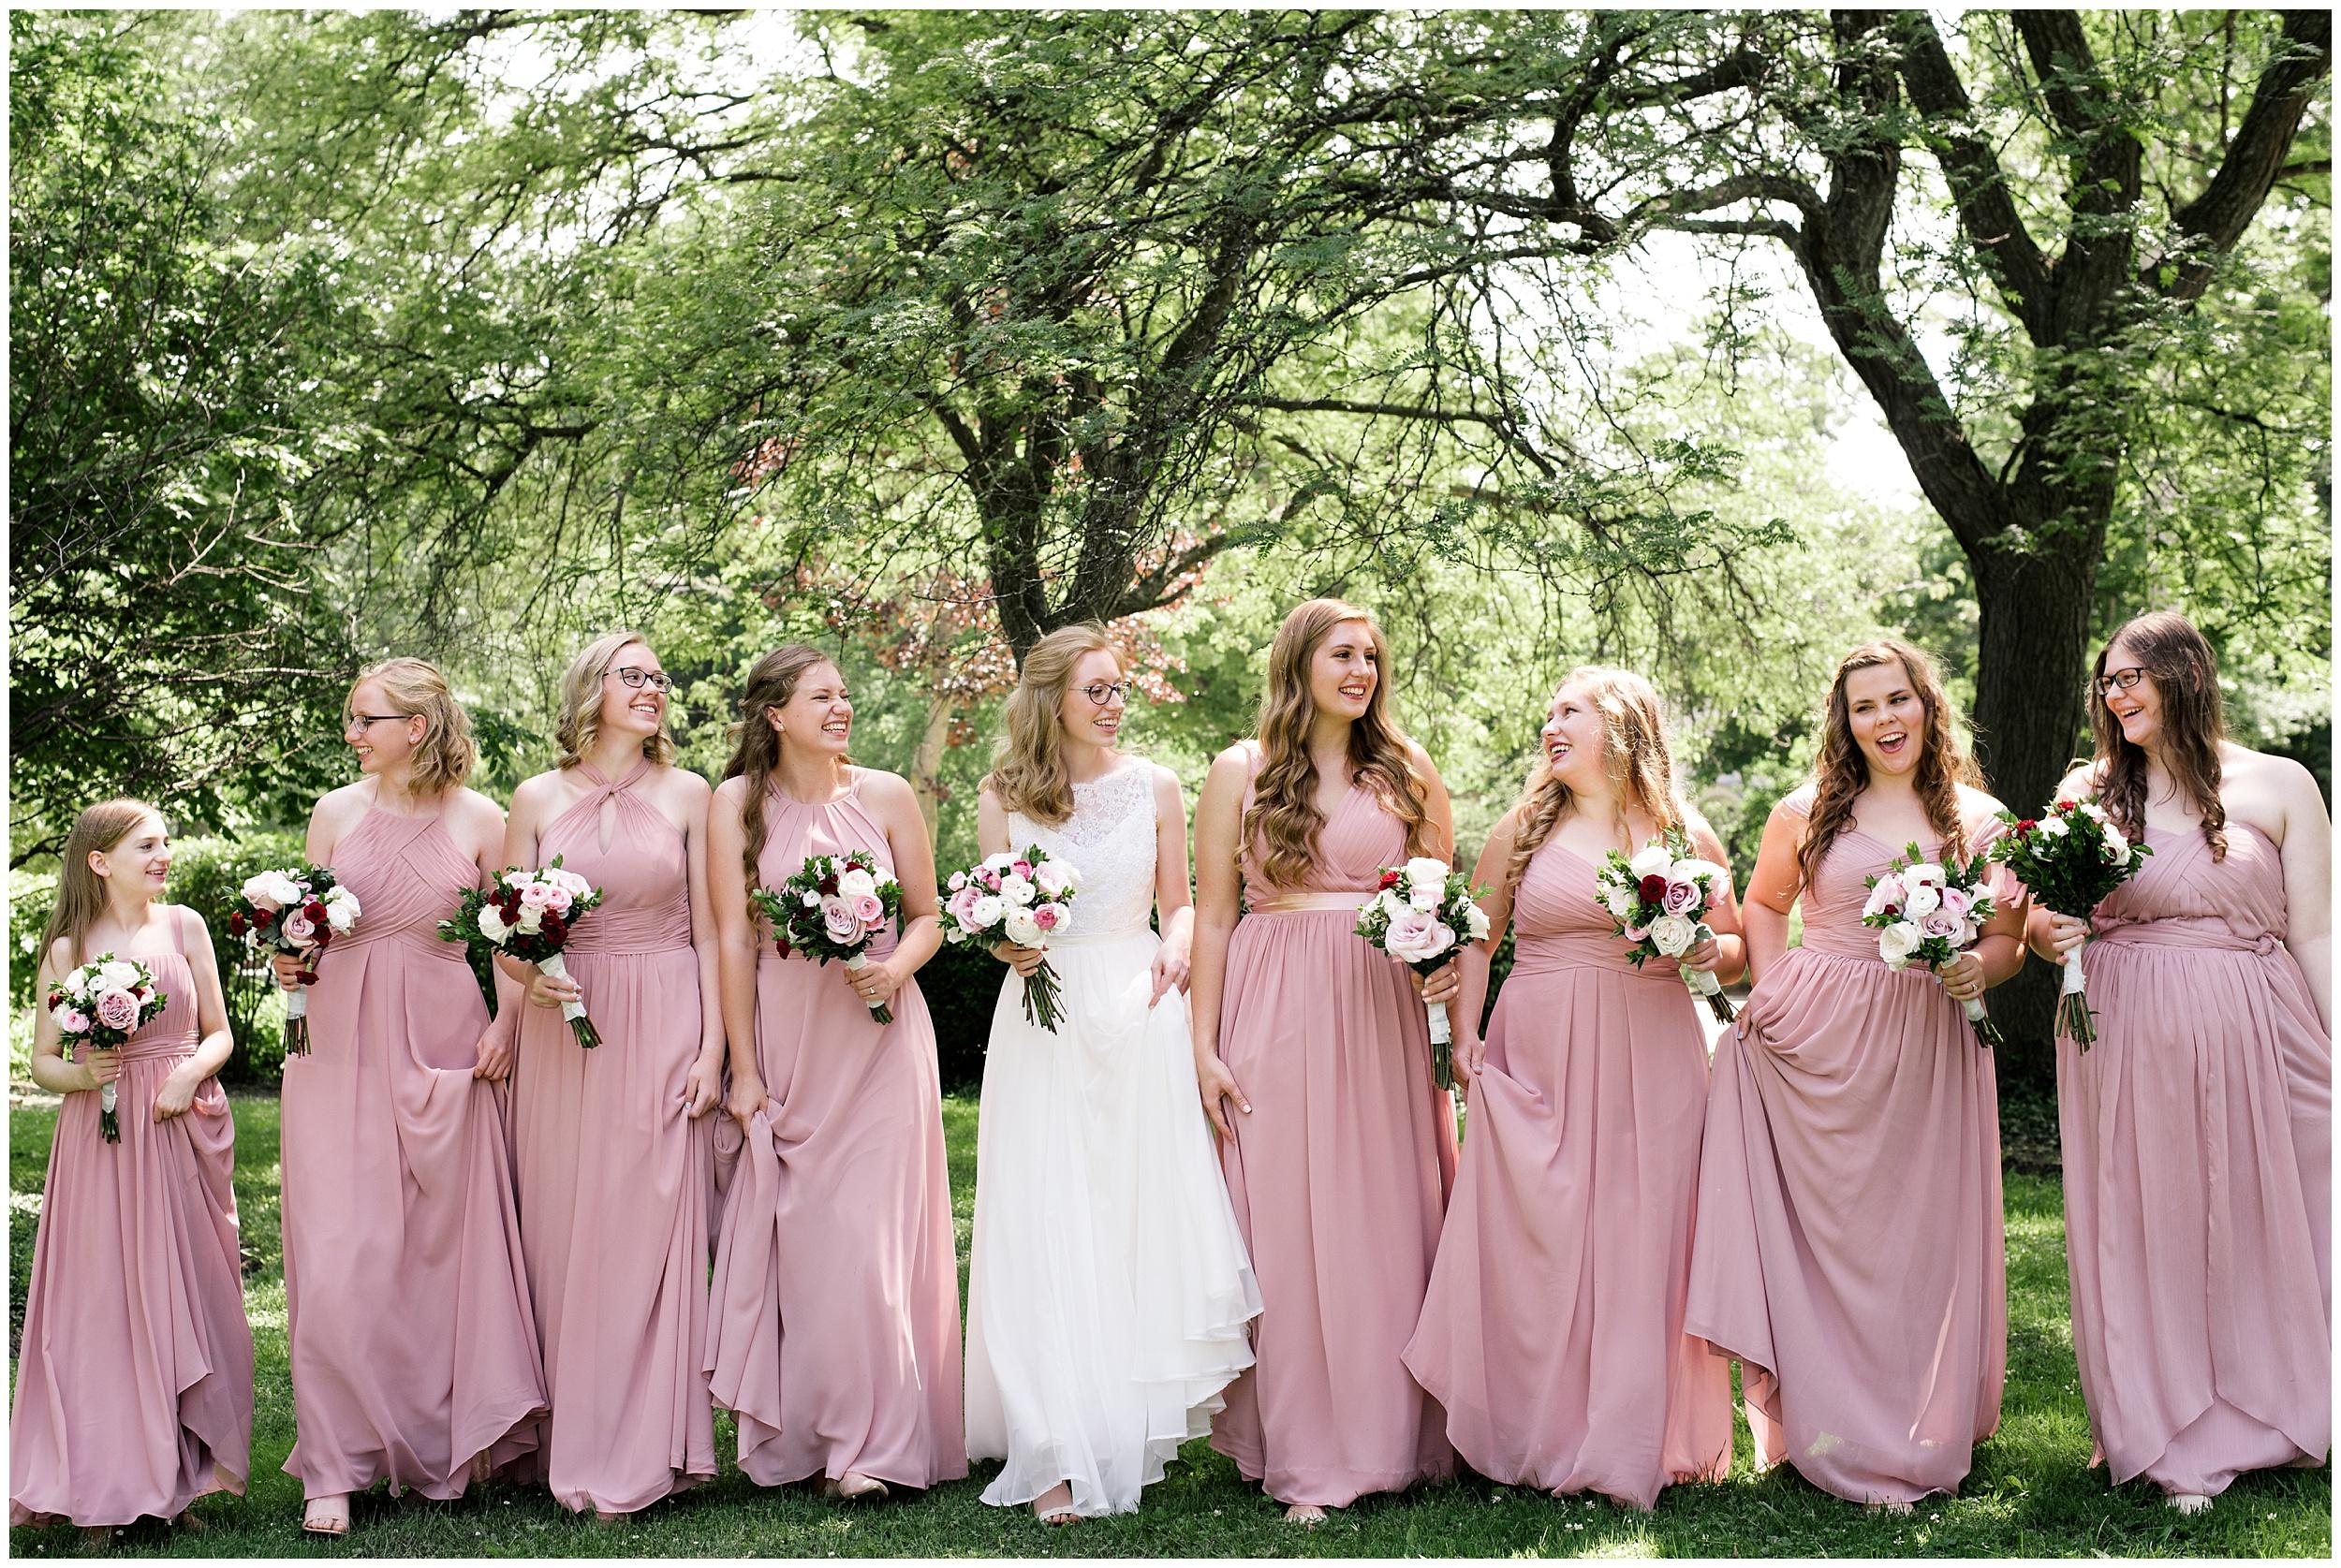 highland-park-community-house-wedding-chicago-wisconsin-photographer_0036.jpg